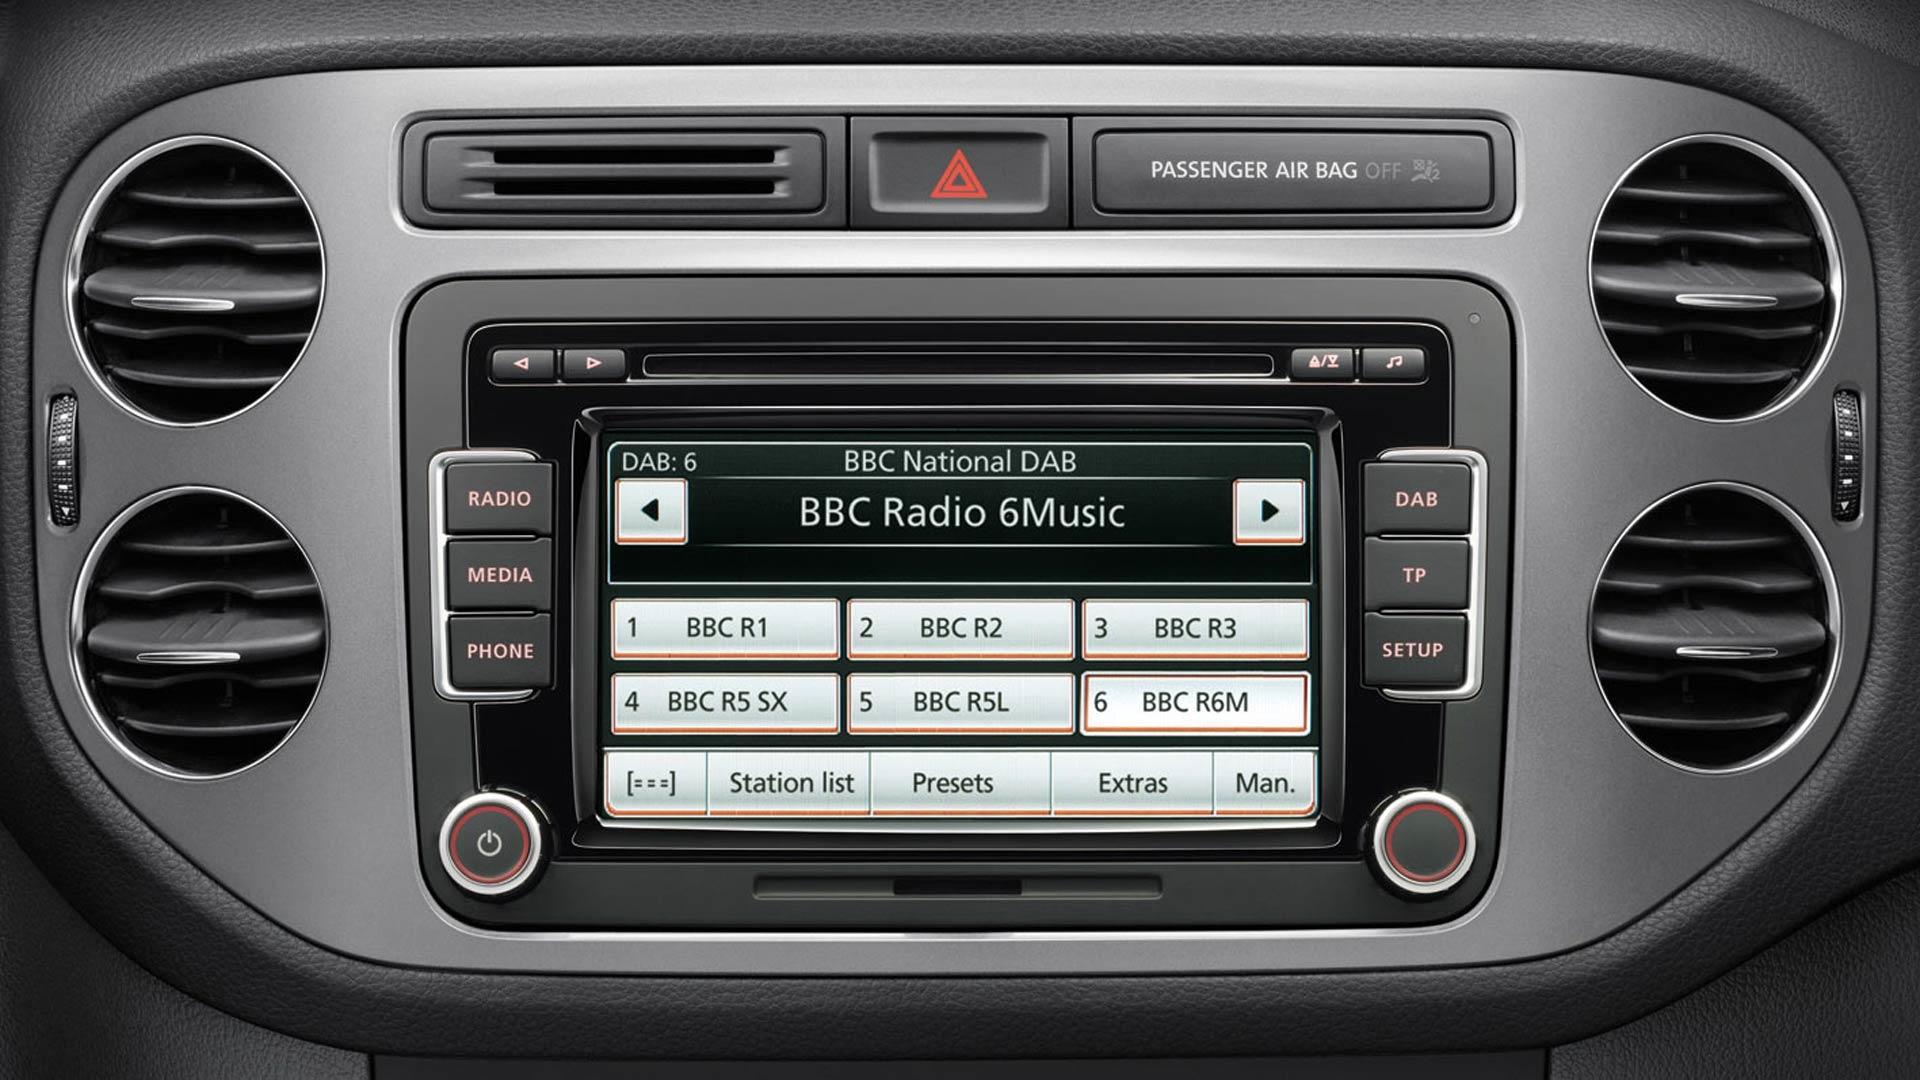 DAB radio to be mandatory in 2020